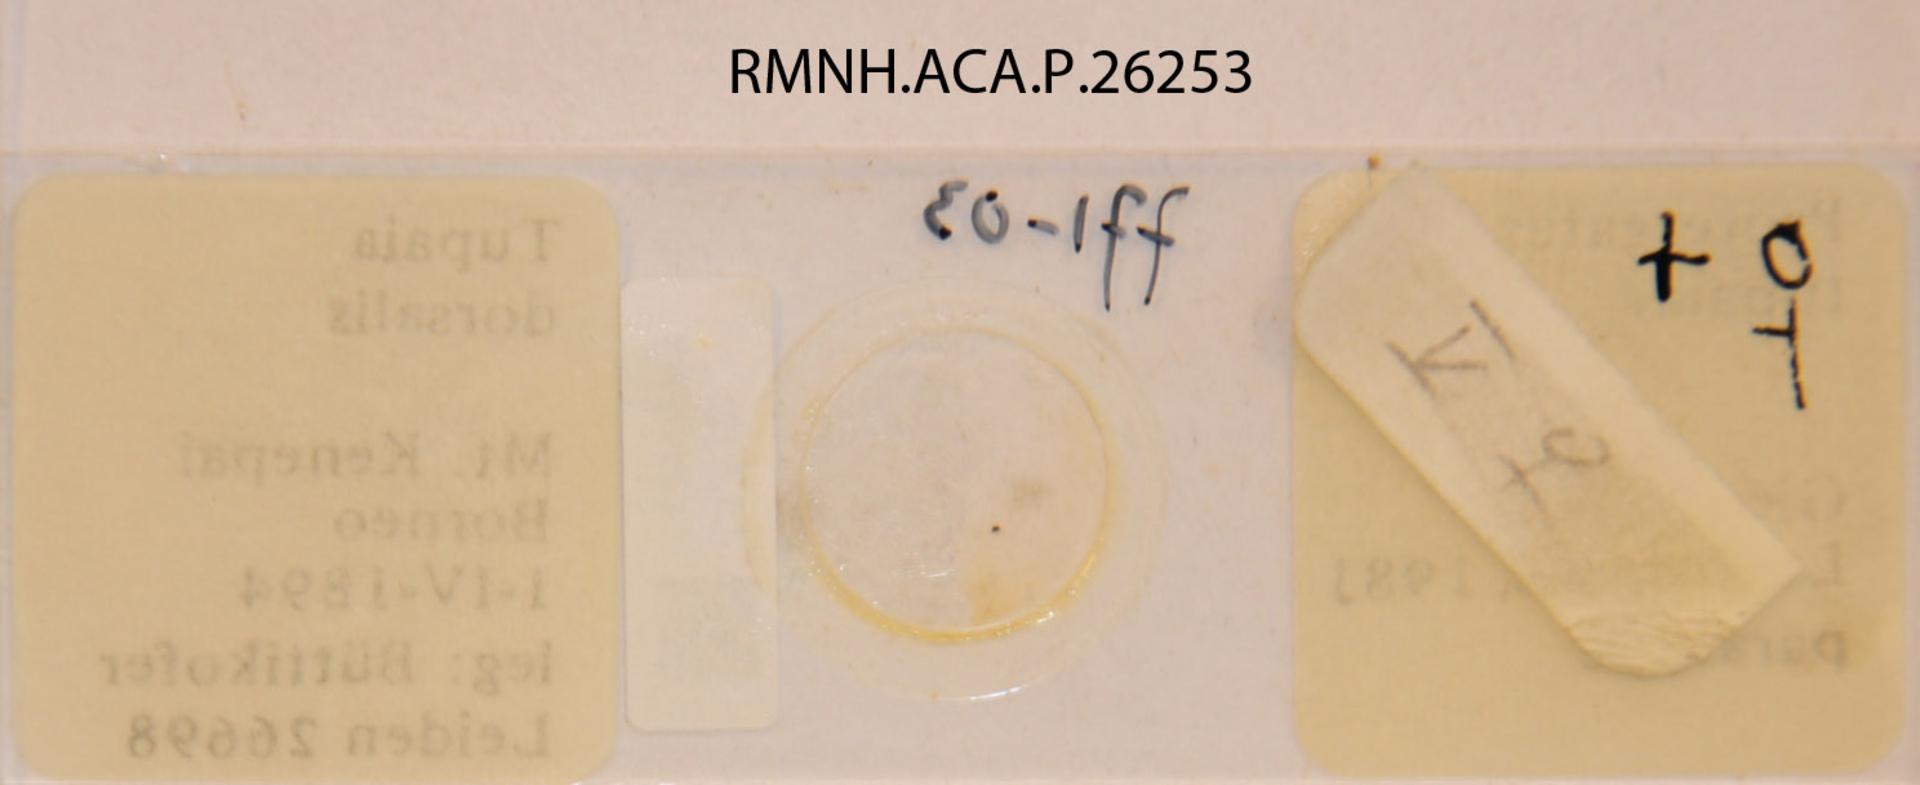 RMNH.ACA.P.26253 | Psorergates tupaiea Giesen, Lukoschus, 1981